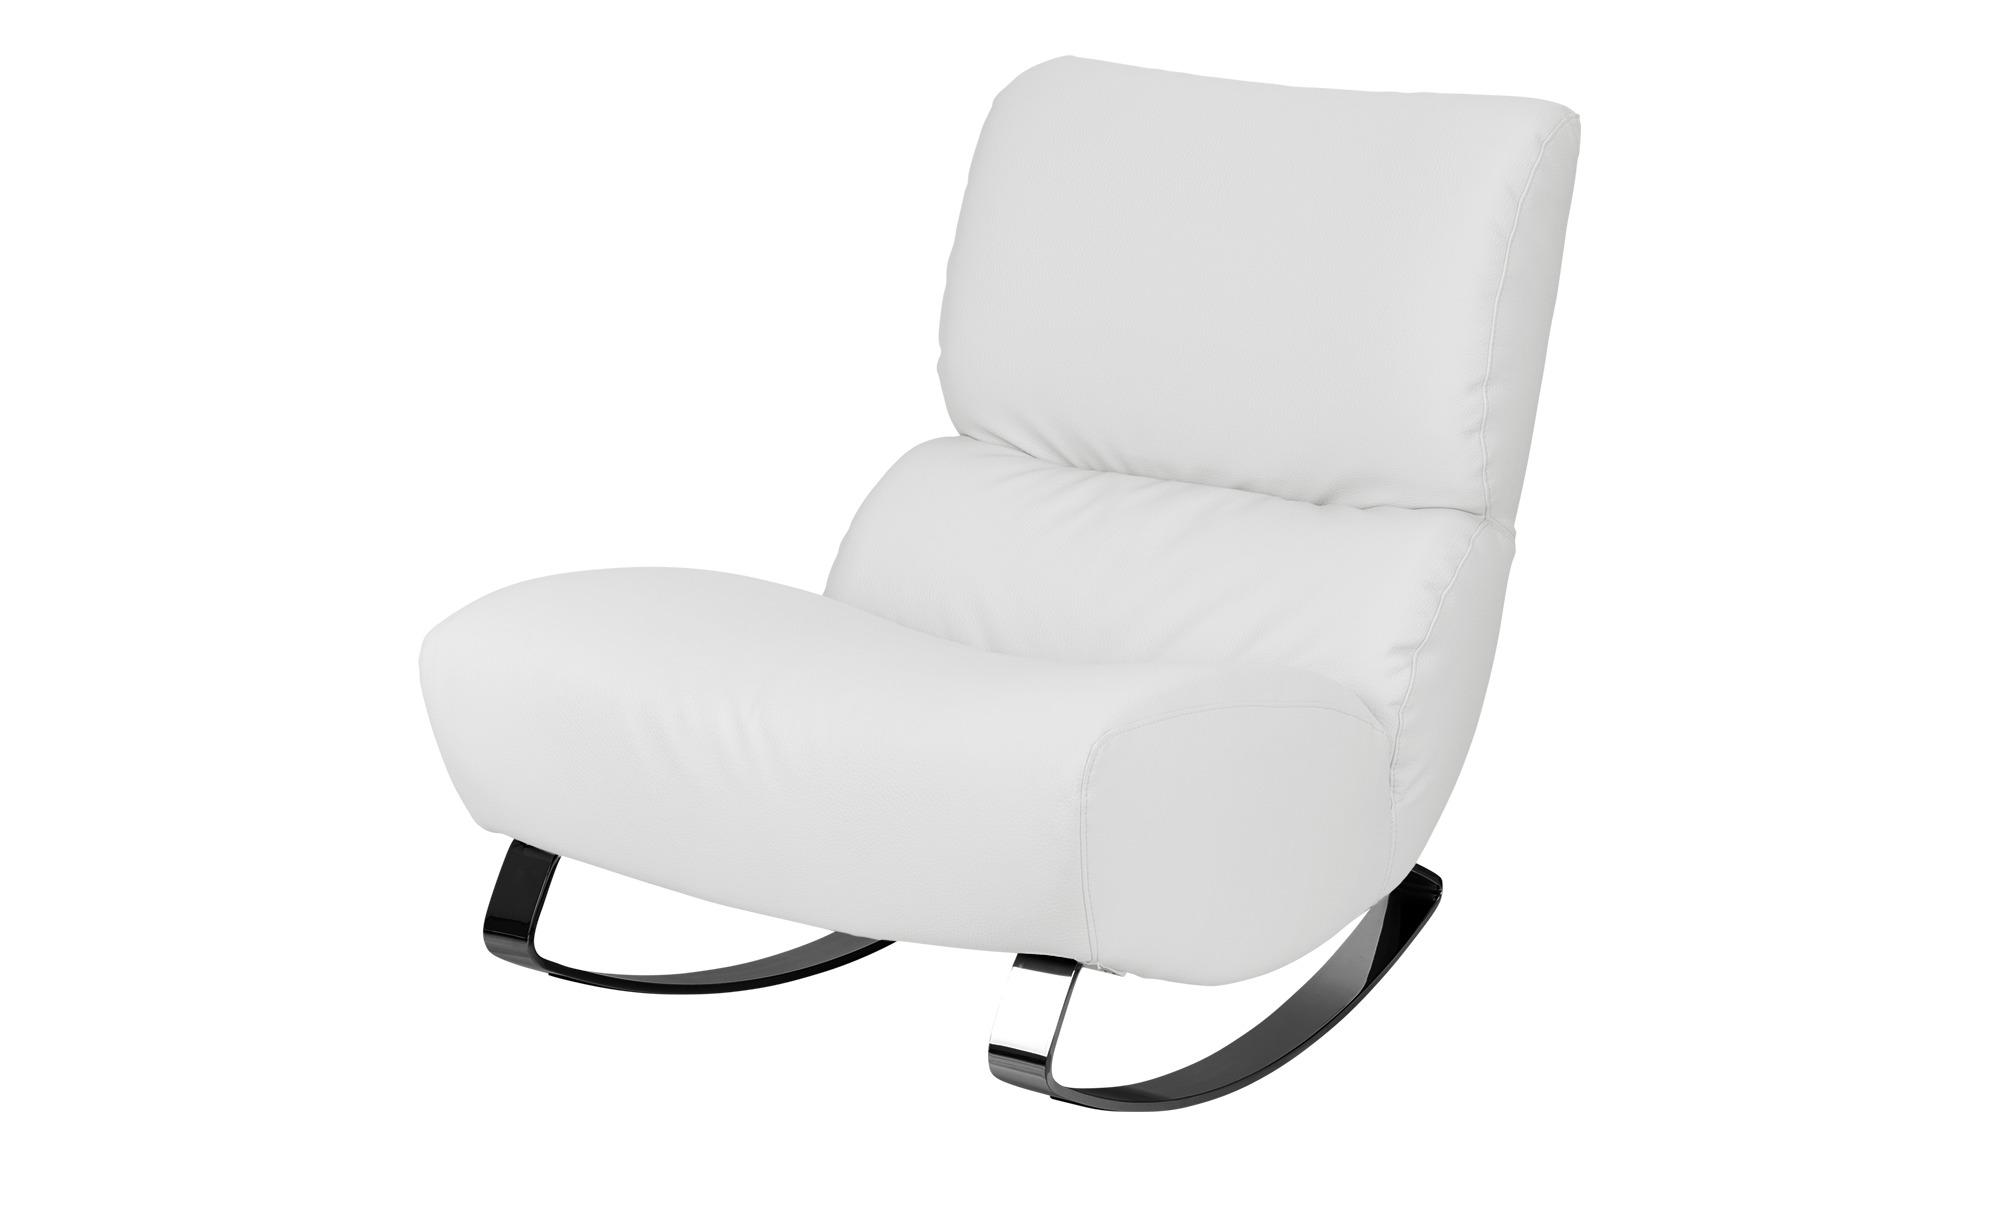 Design-Sessel weiß - Kunstleder Citole ¦ weiß ¦ Maße (cm): B: 76 H: 90 T: 103 Polstermöbel > Sessel > Polstersessel - Höffner